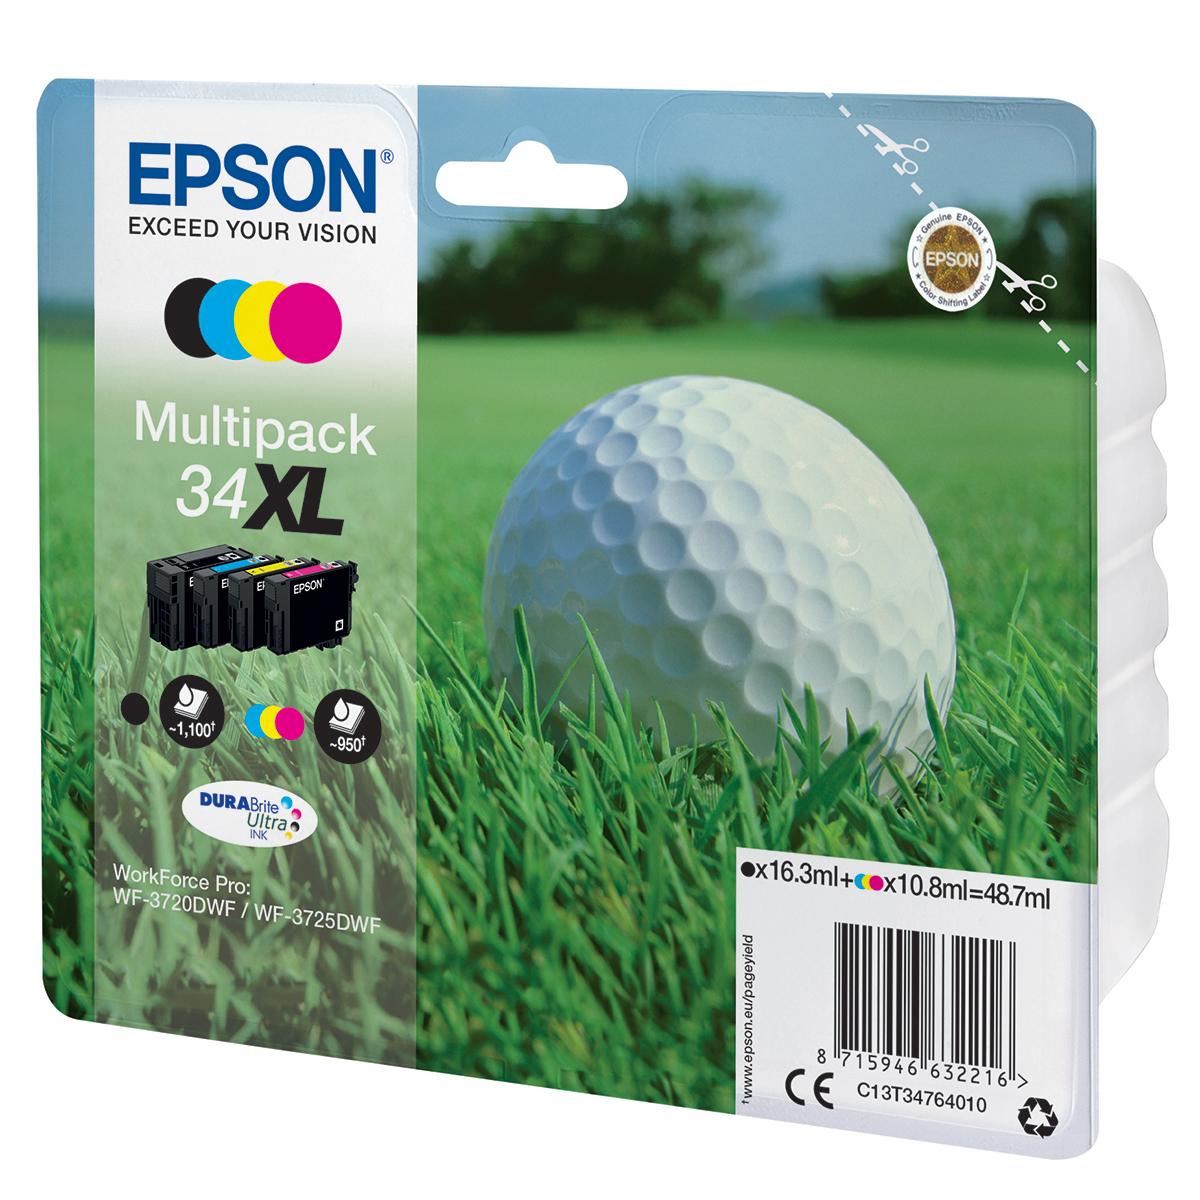 Epson 34XL Multipack 4 Ink Durabrite Ultra Cartridges